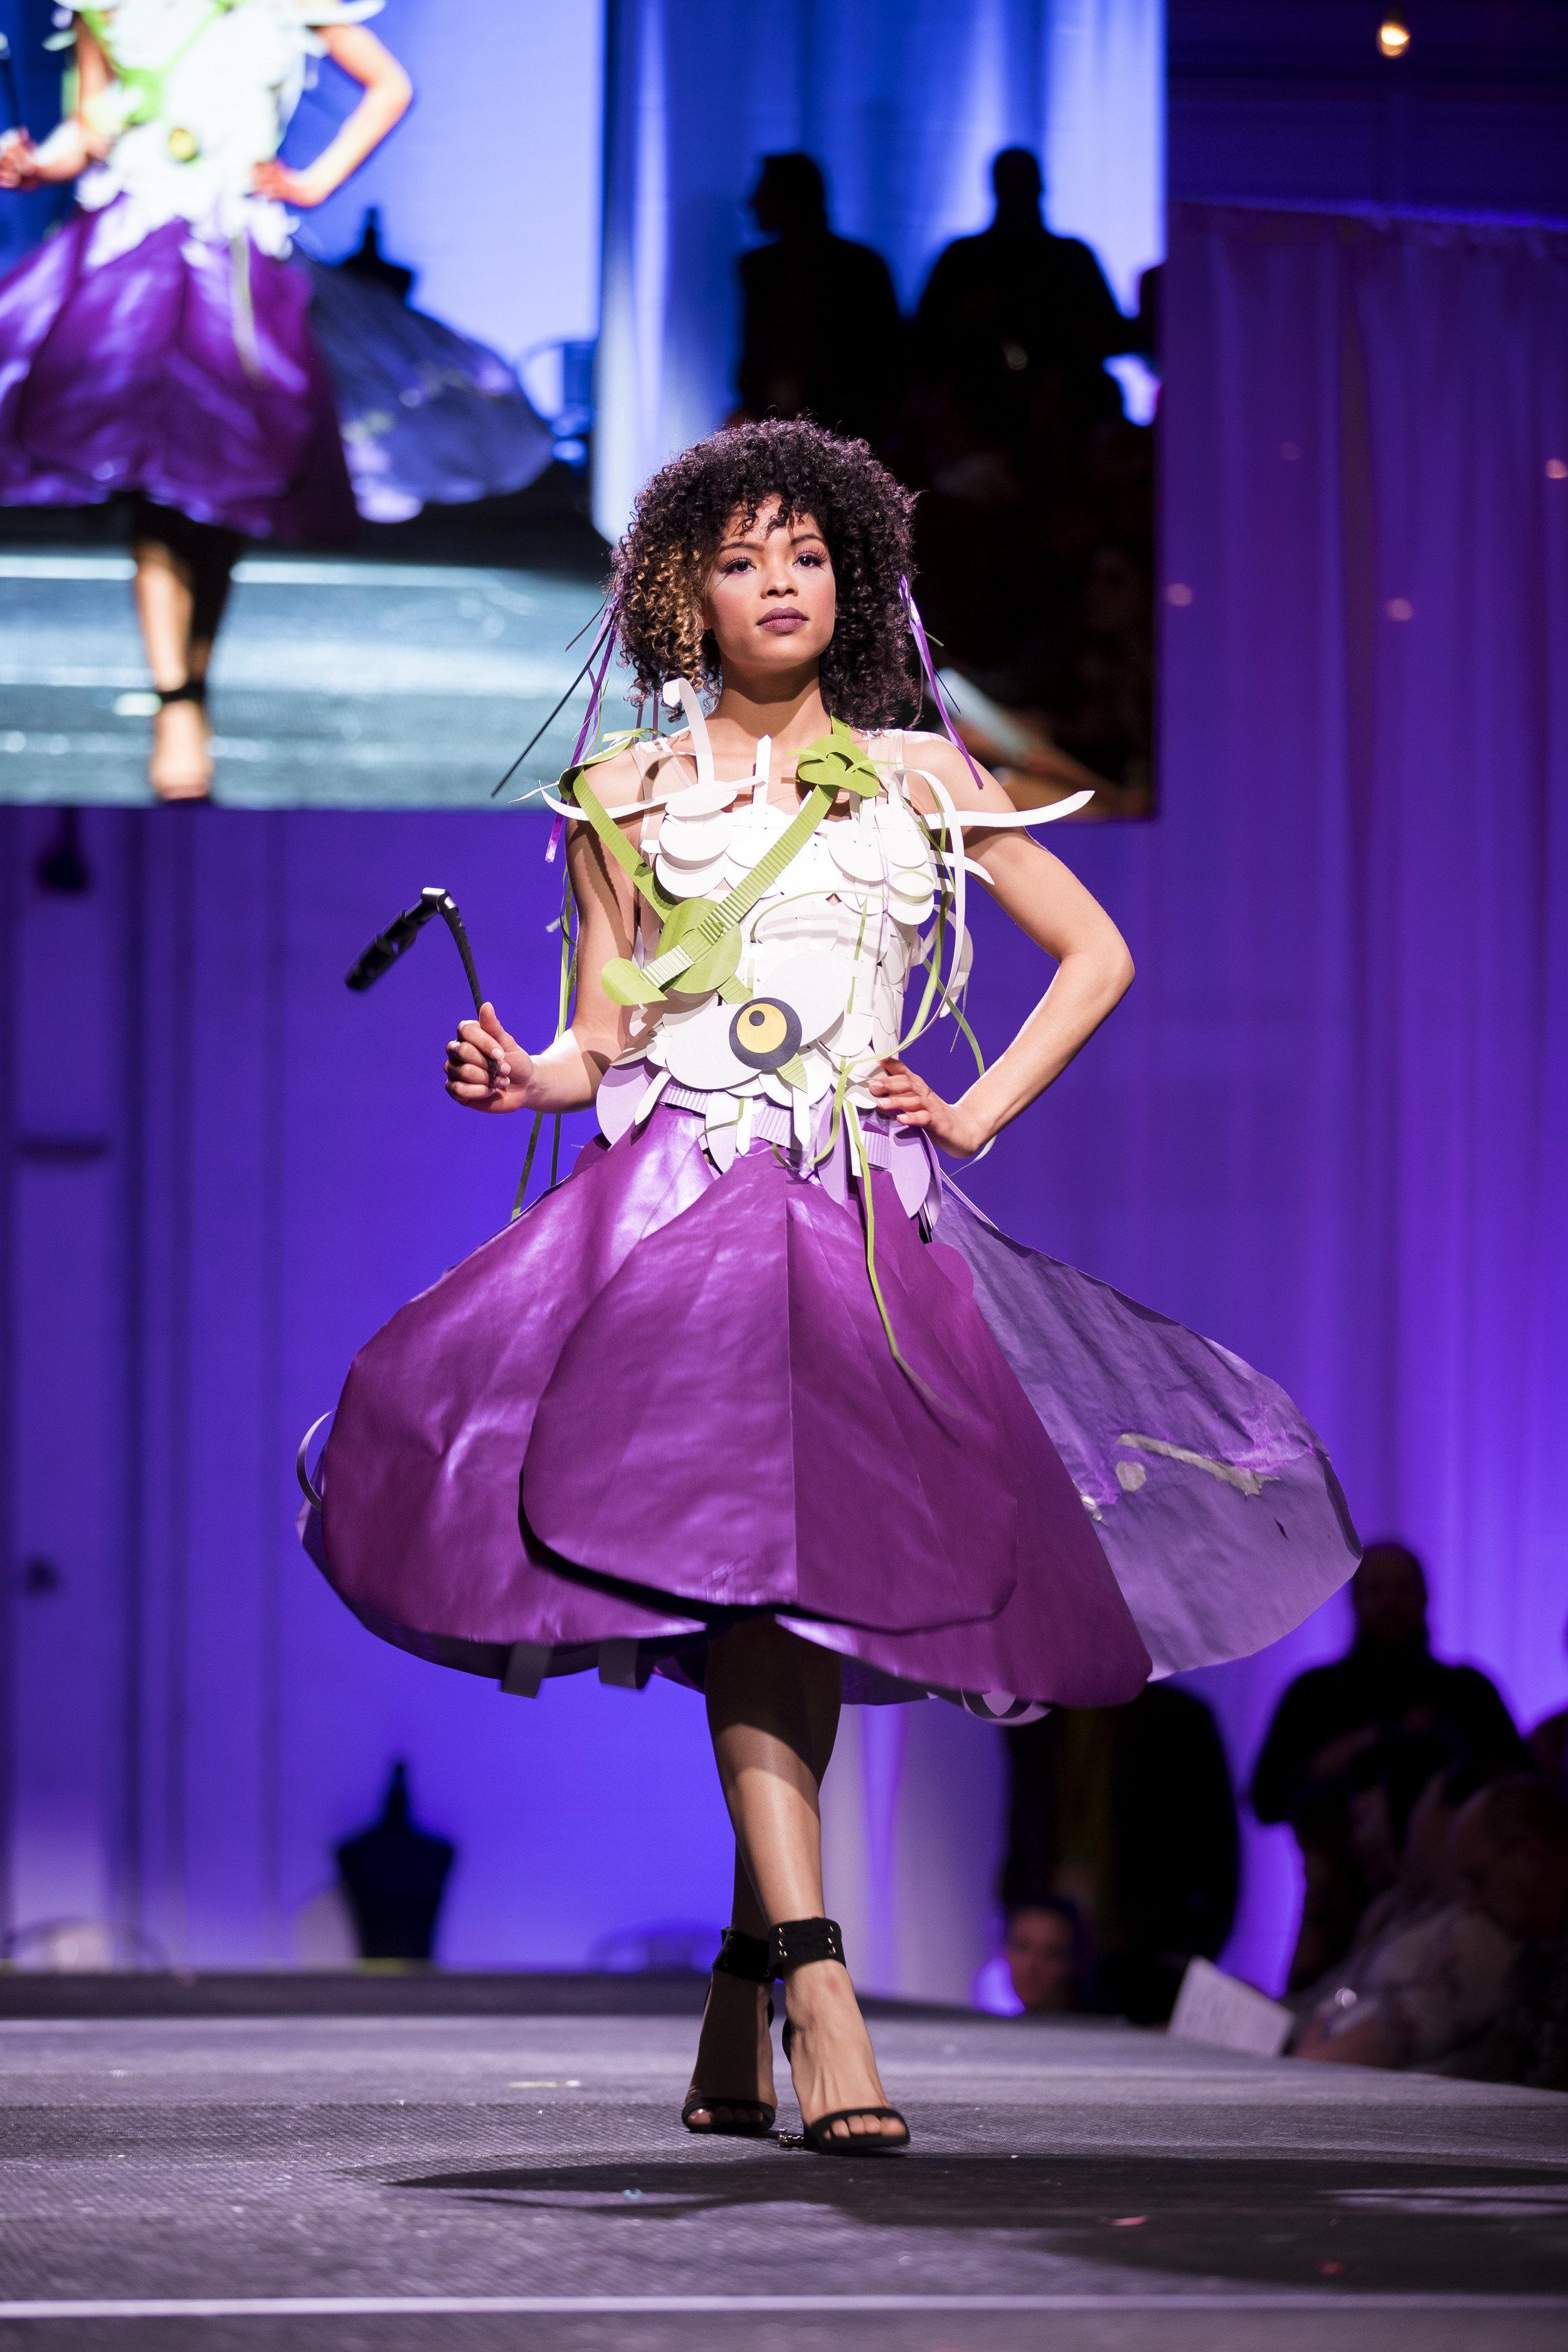 Paper Fashion Show 2019 - 041.jpg